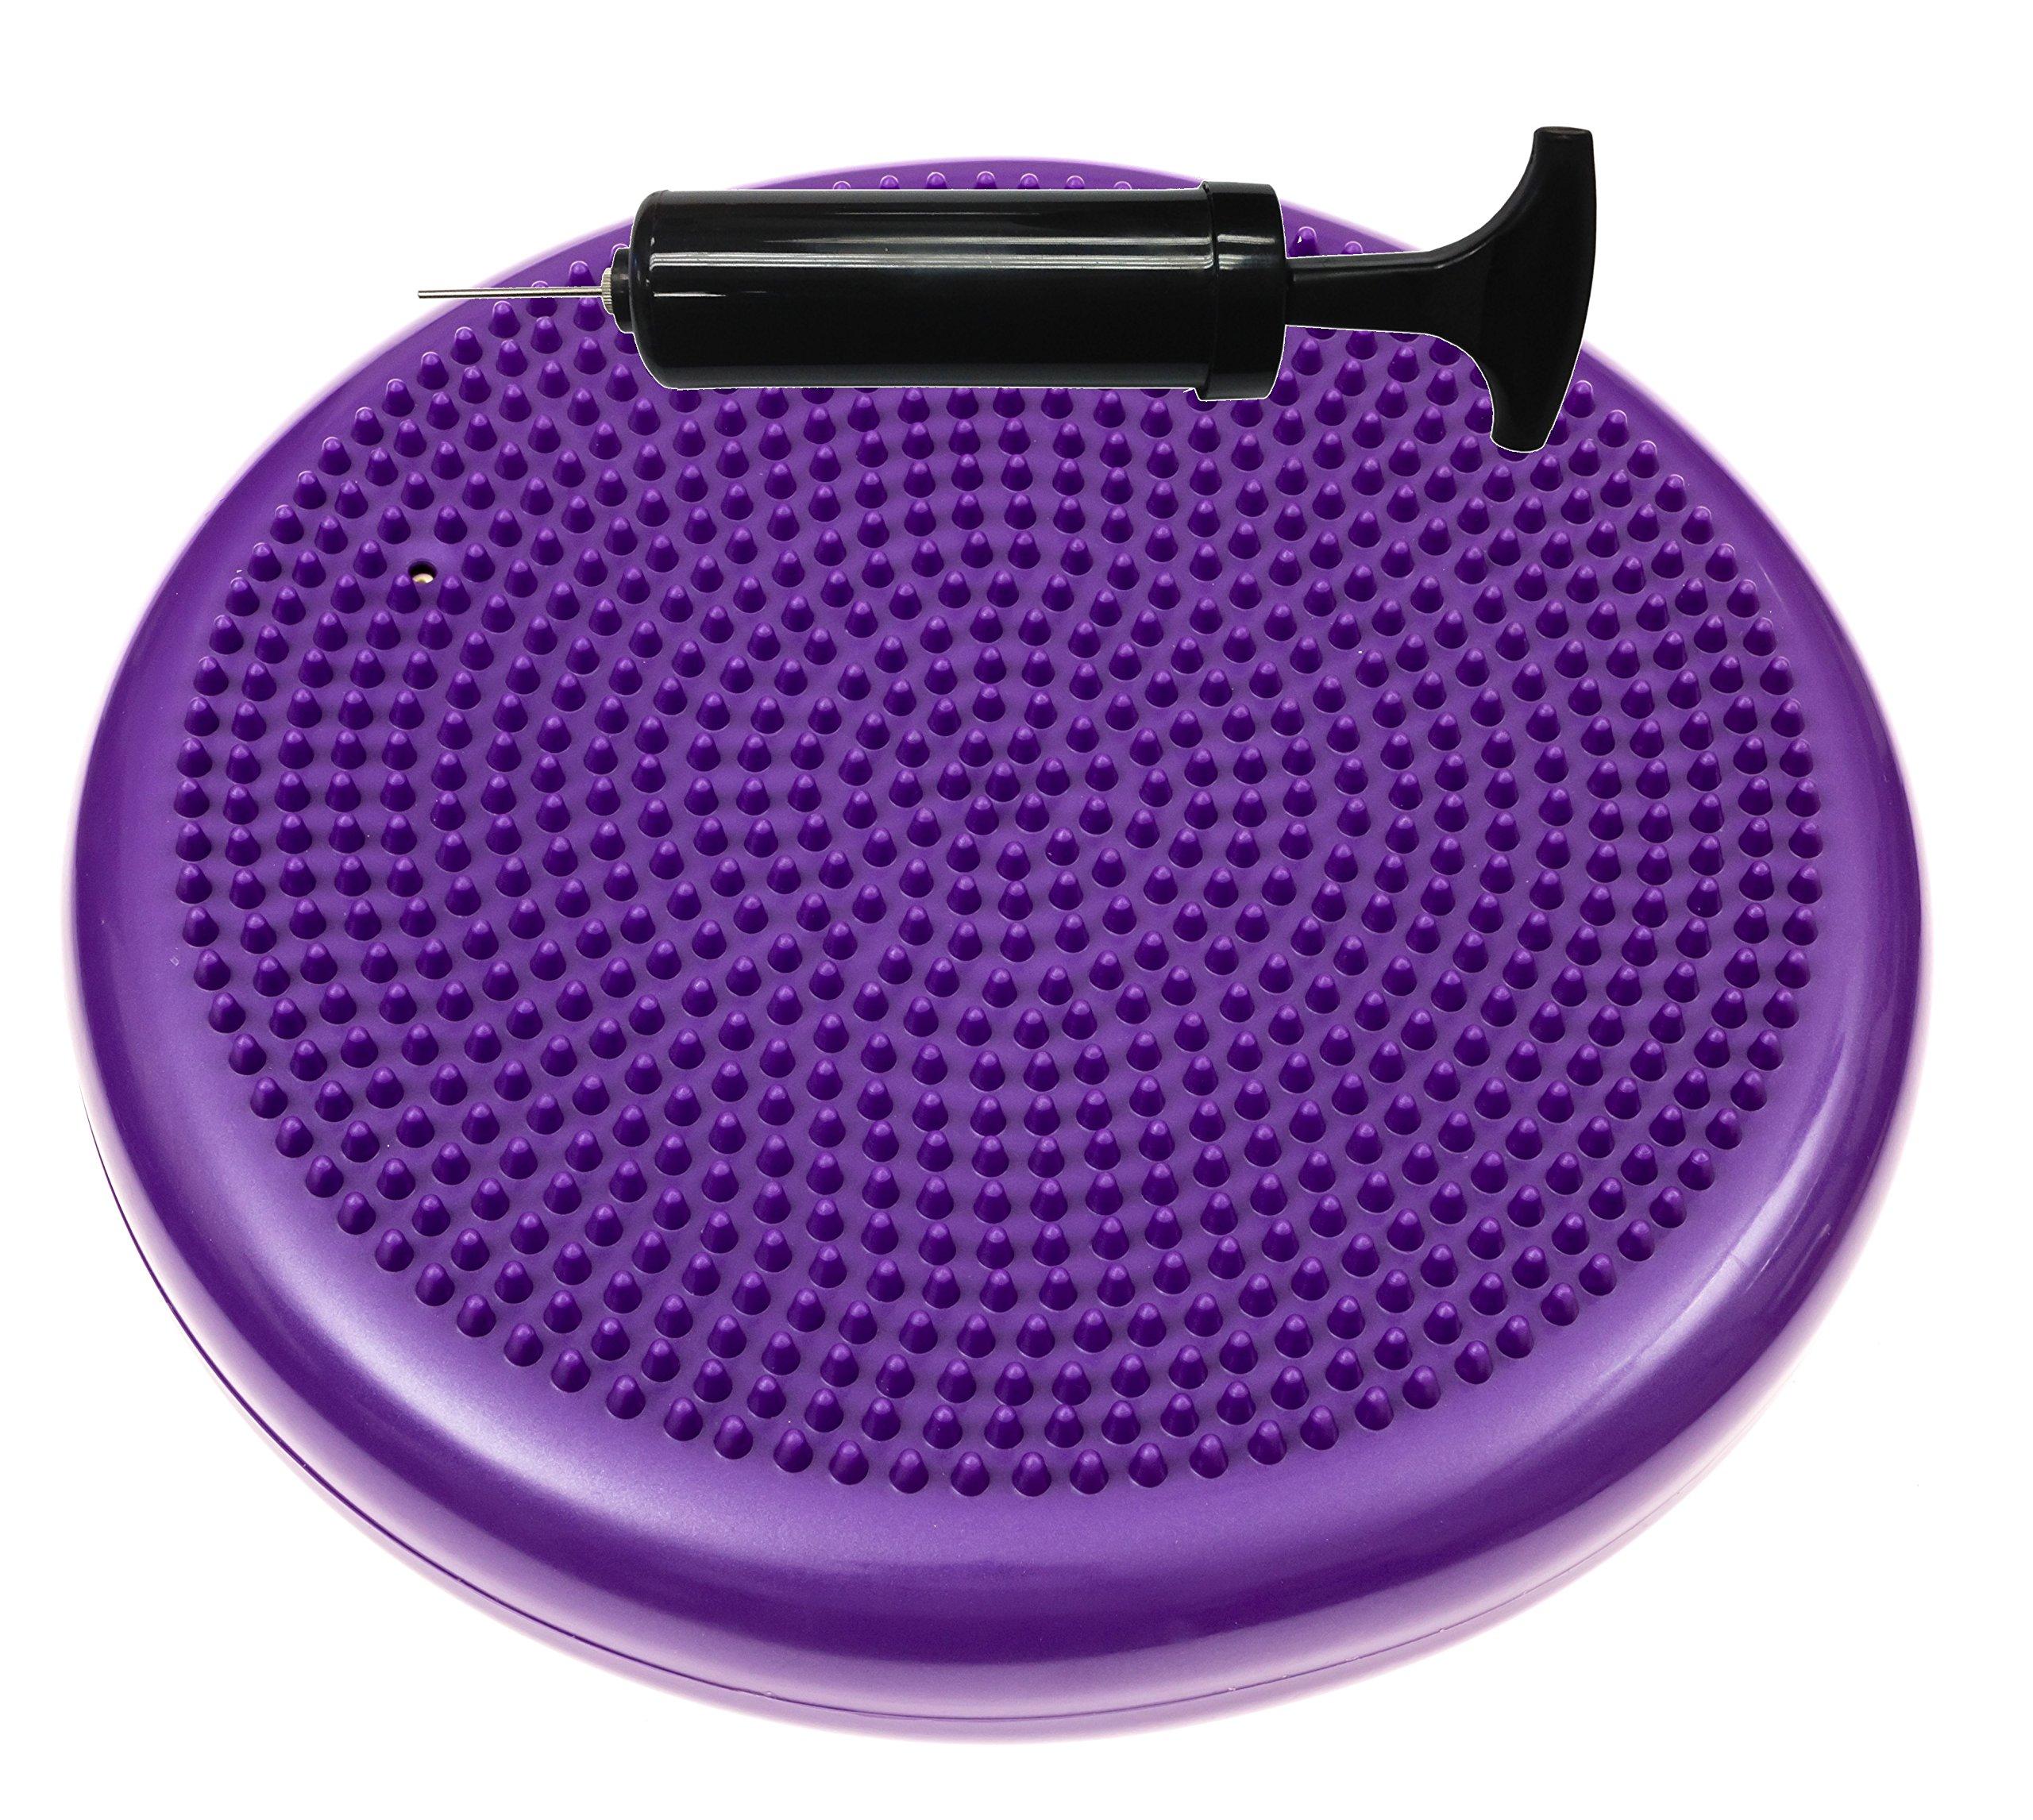 bintiva round balance disc purple 33cm by bintiva (Image #10)